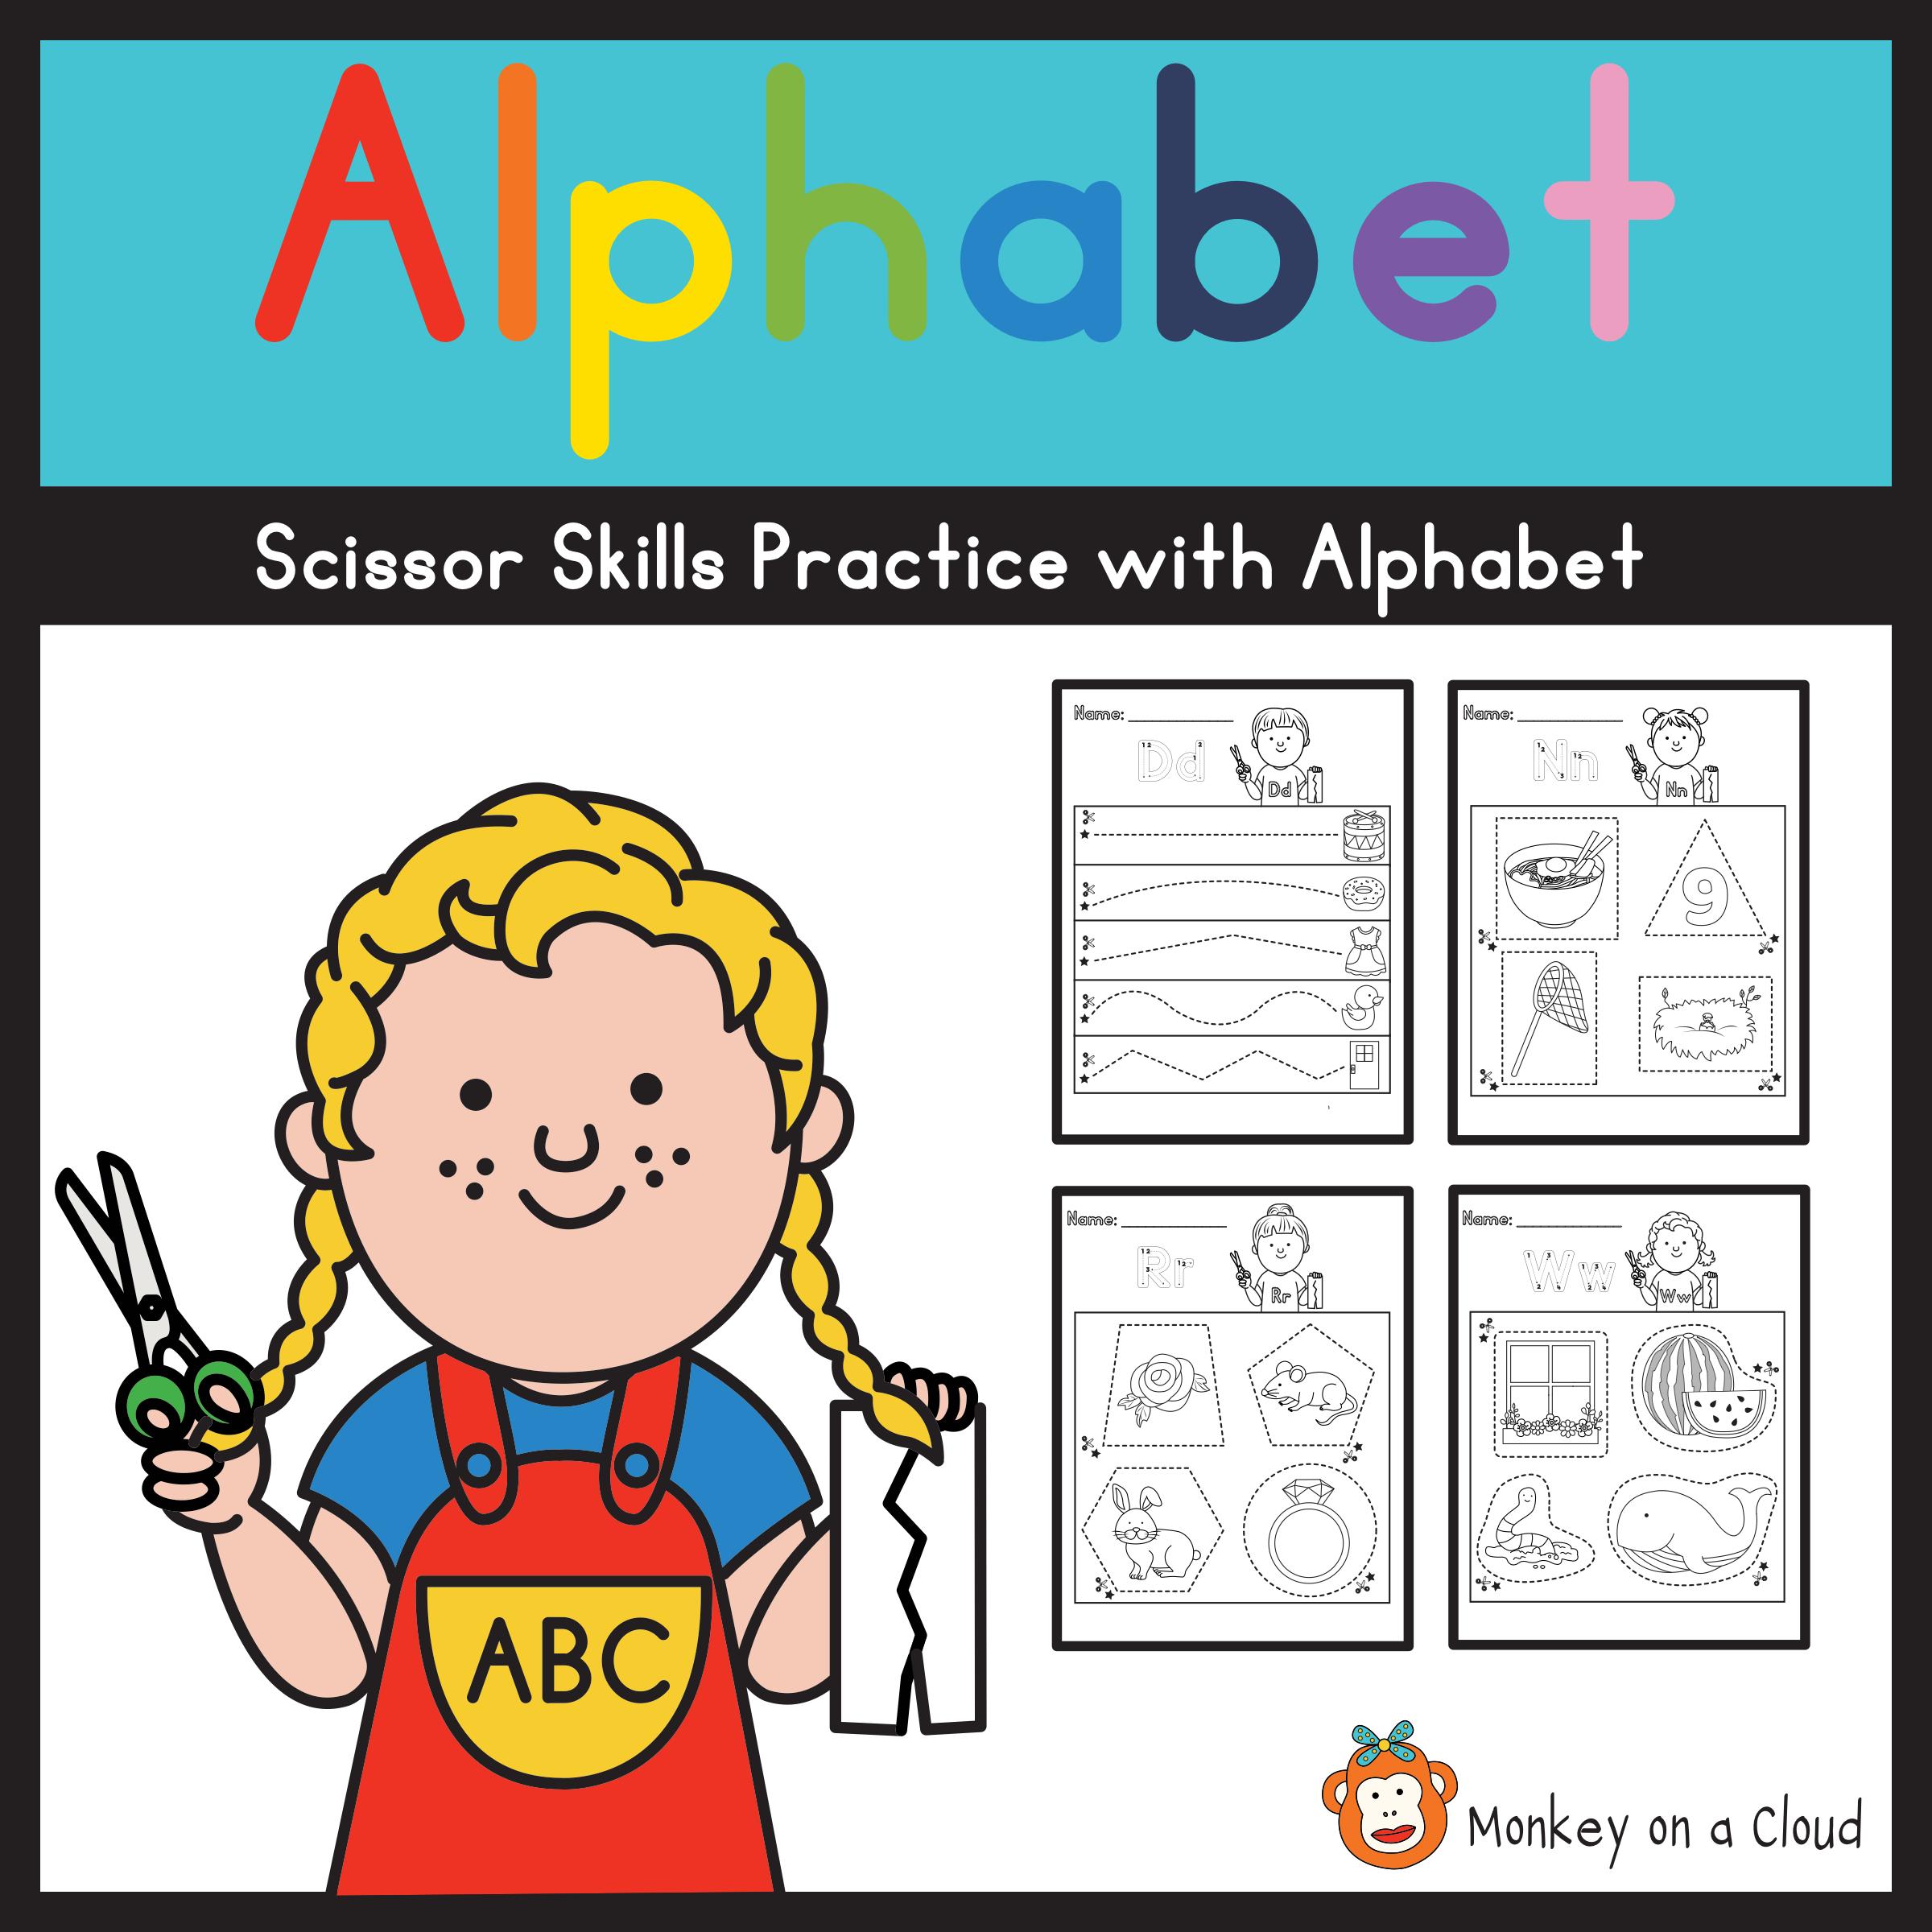 Scissor Skills Practice With Alphabet In